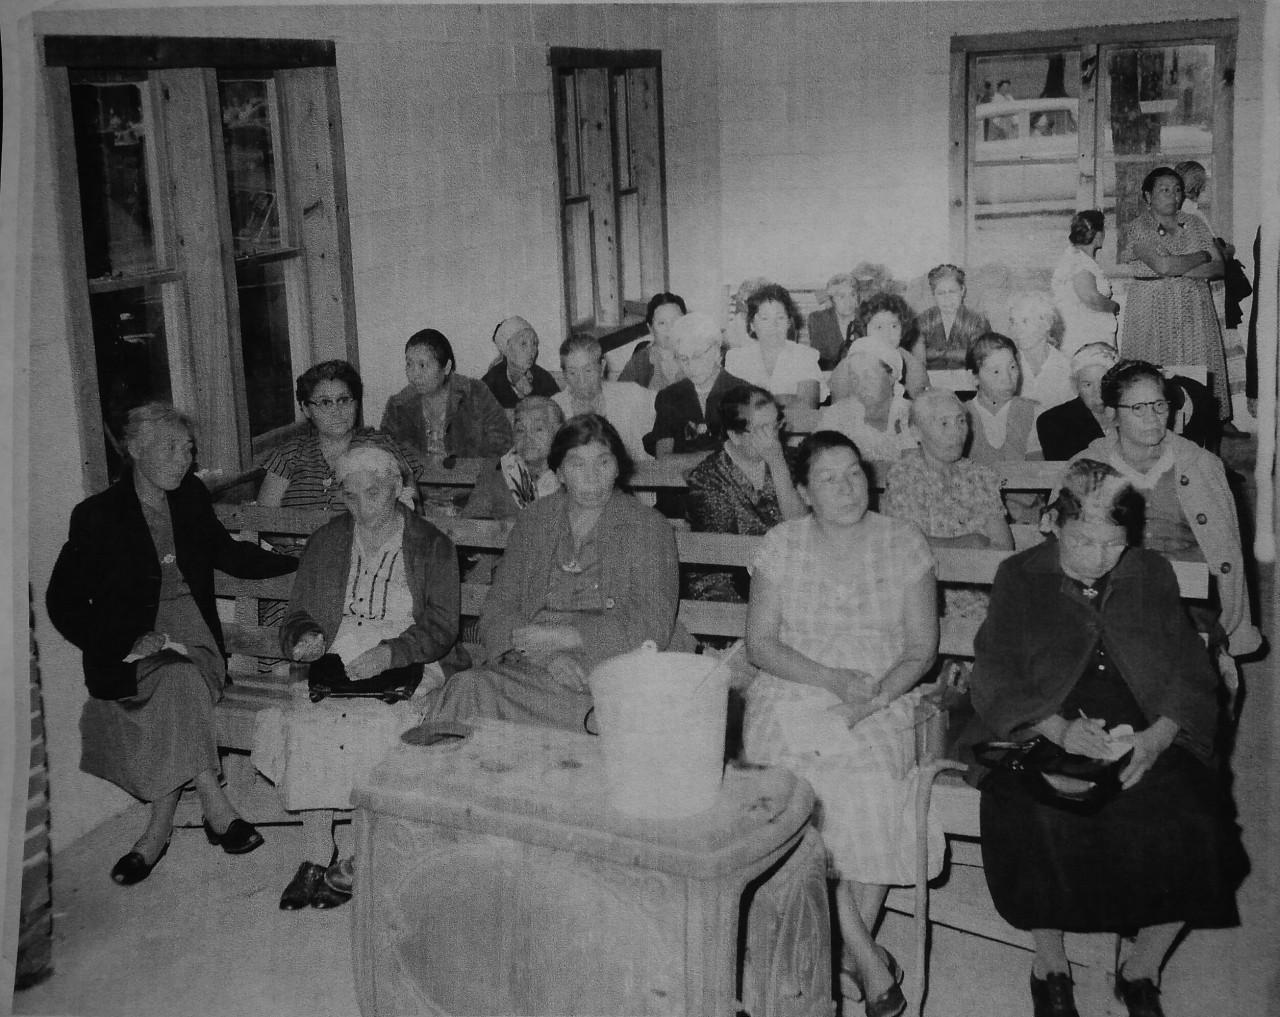 Cherokee Association celebrates 150th anniversary